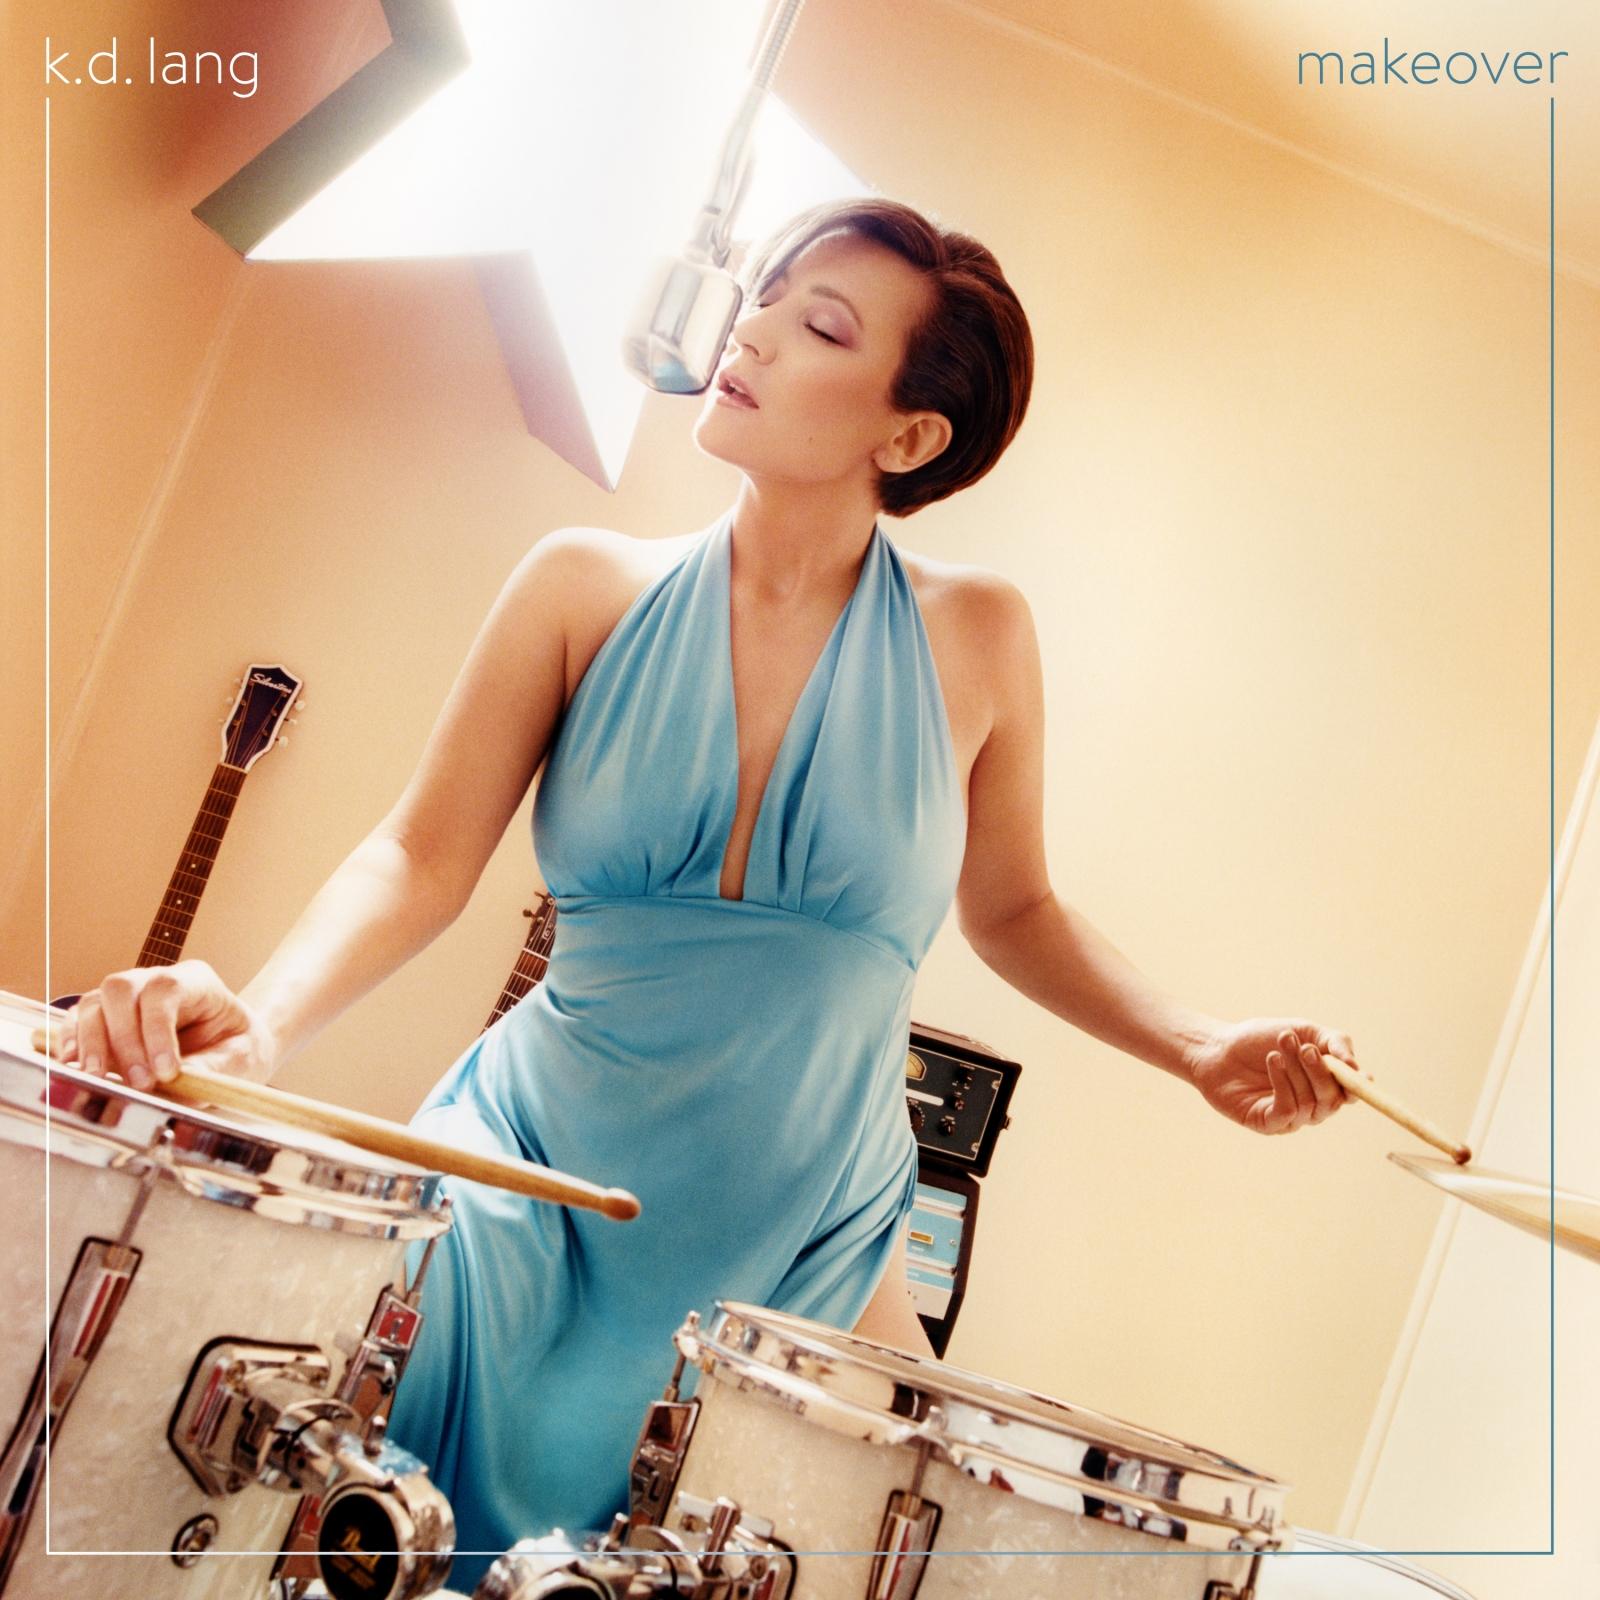 Виниловая пластинка k.d. Lang - makeover (Transparent Turquoise Vinyl)